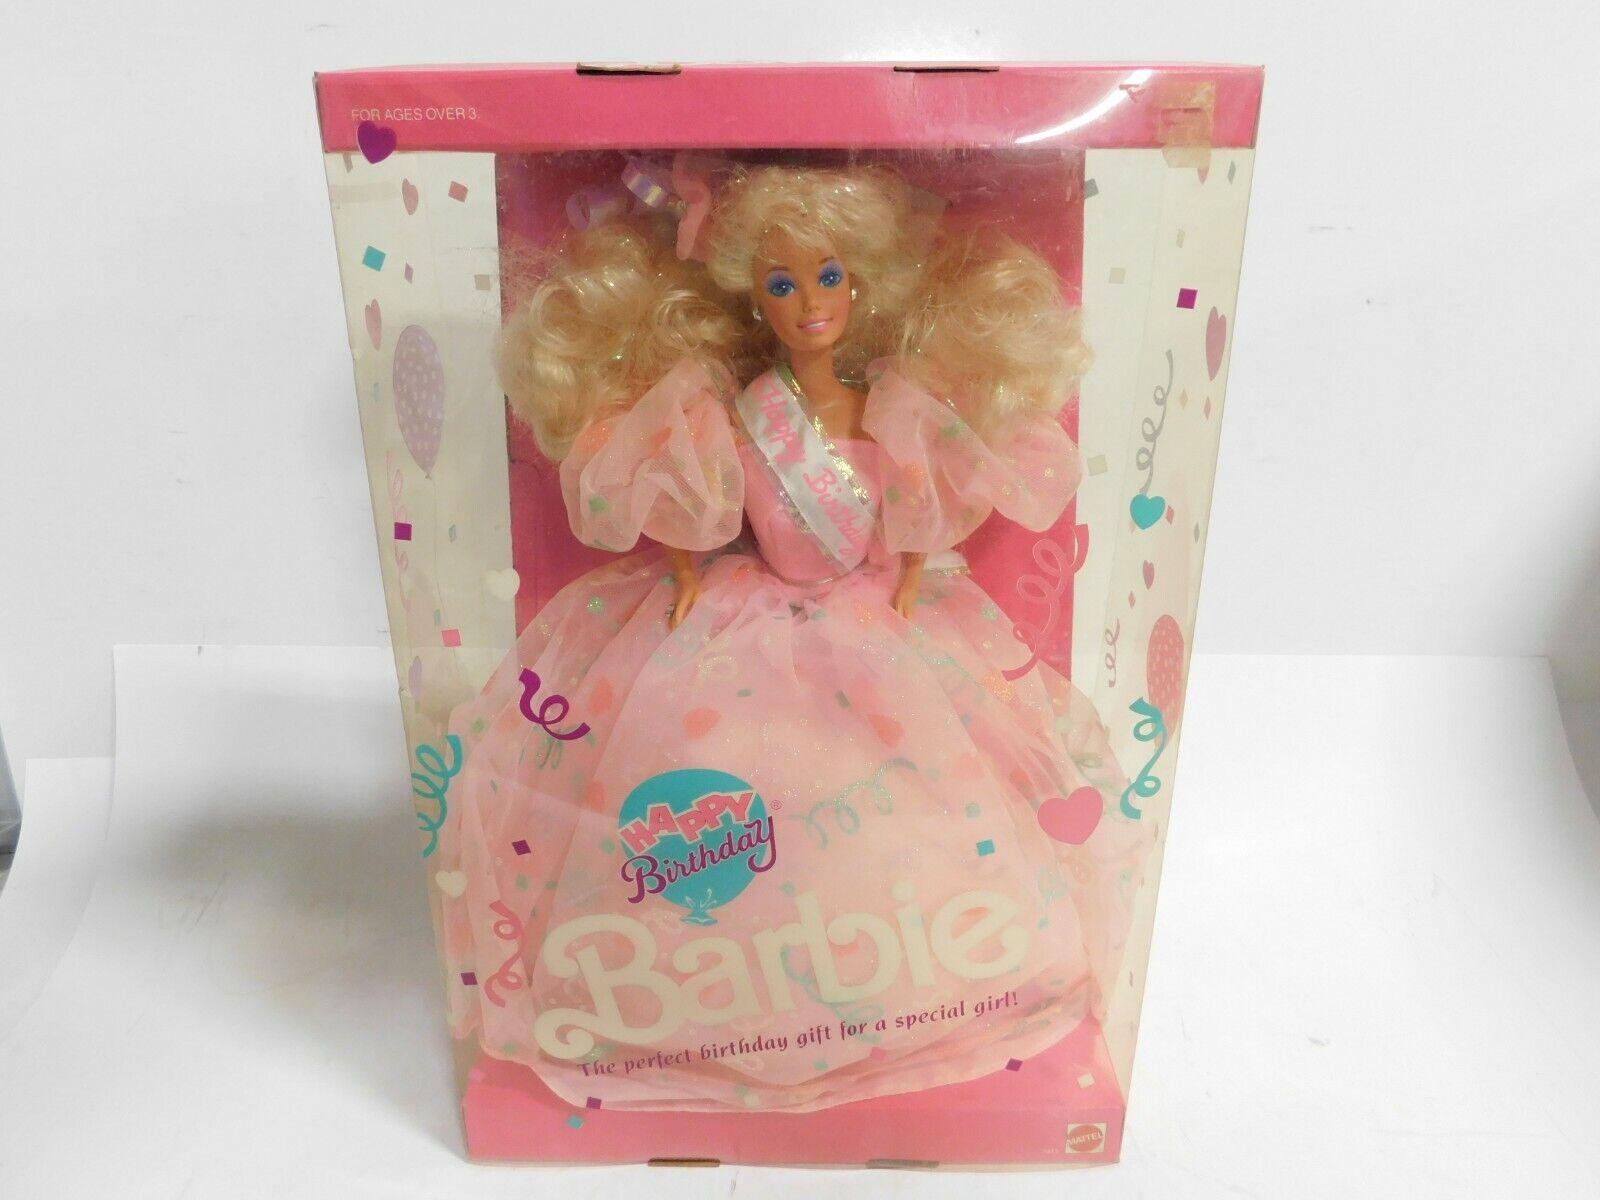 NEW Vintage Mattel Happy Birthday 1990 Barbie Doll NRFB